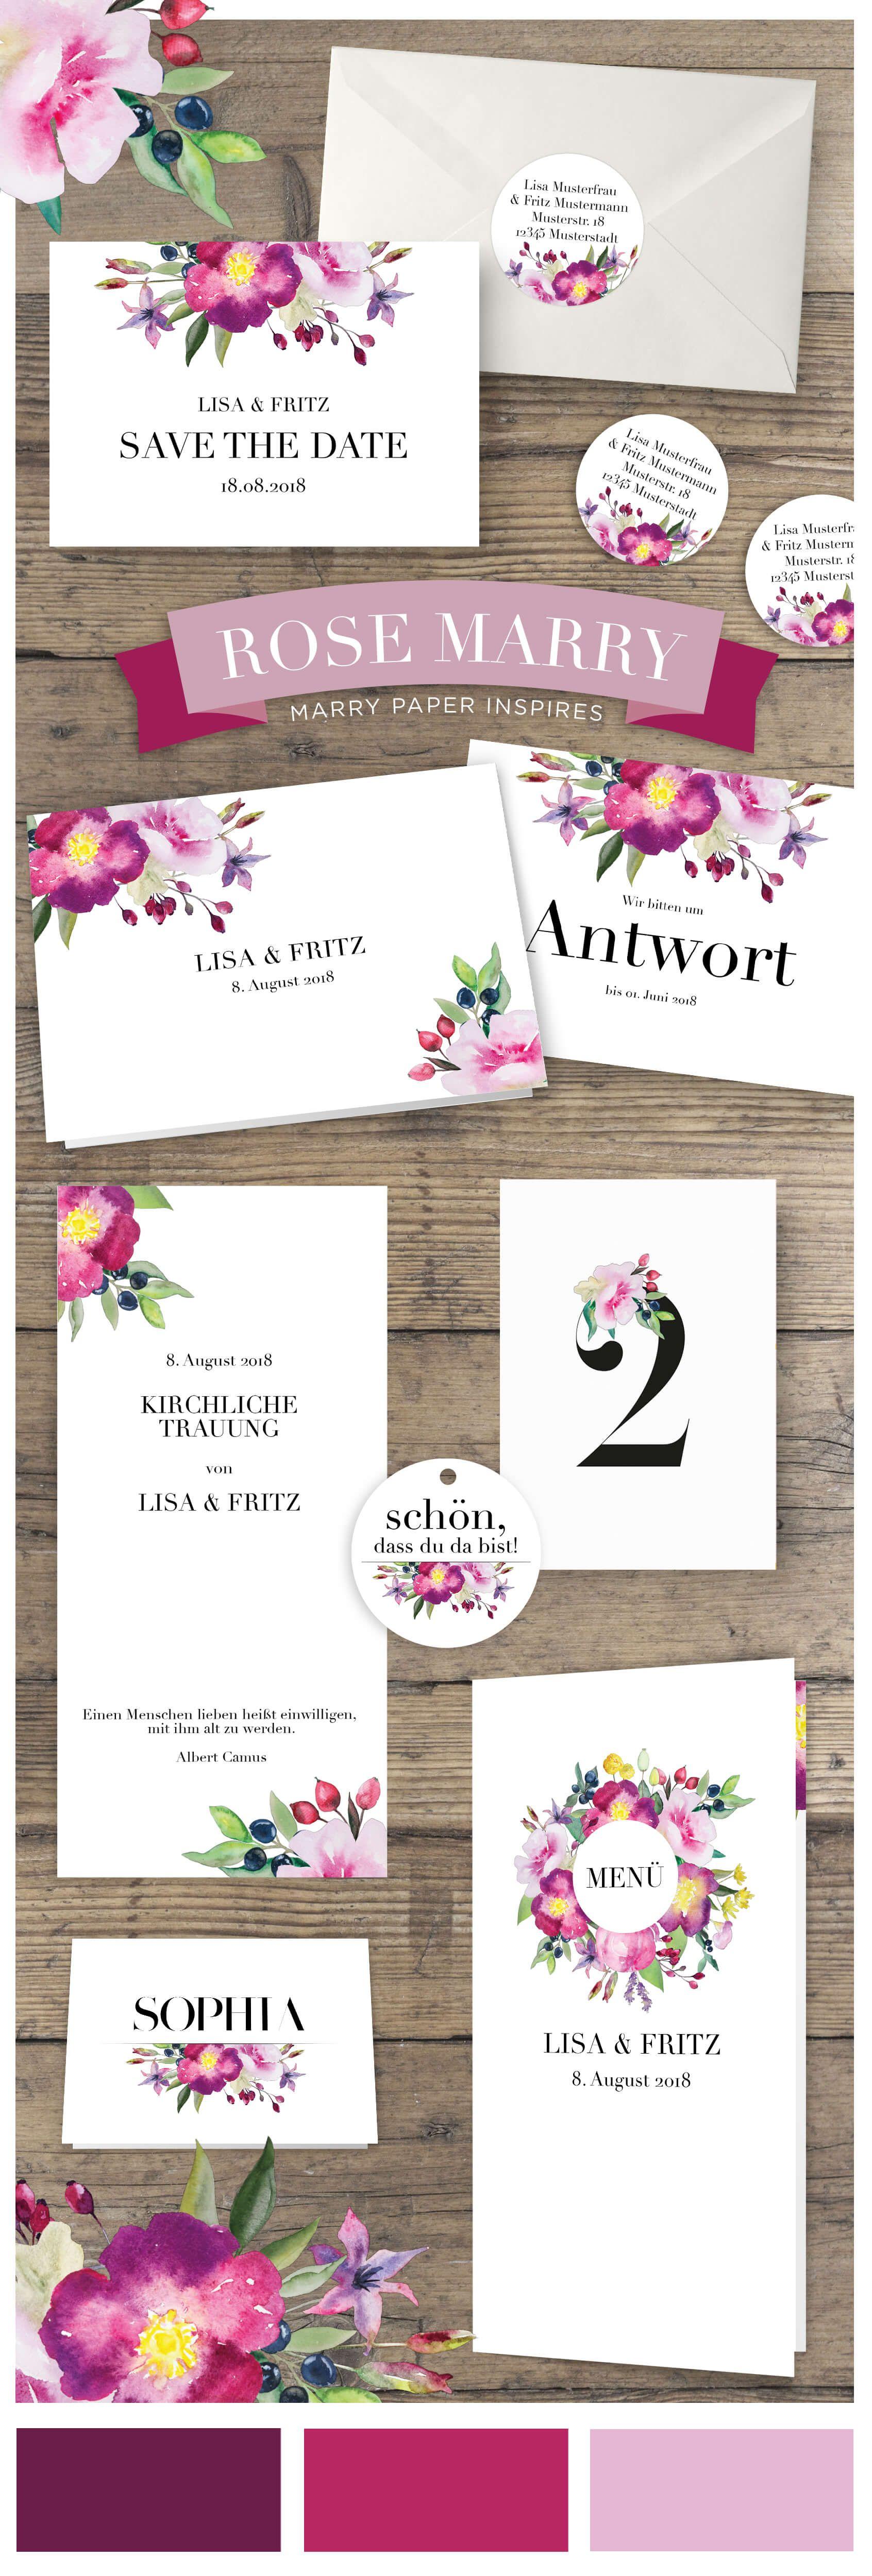 Rose Marry Hochzeitskarten Wilde Romantik In Aquarell Wedding